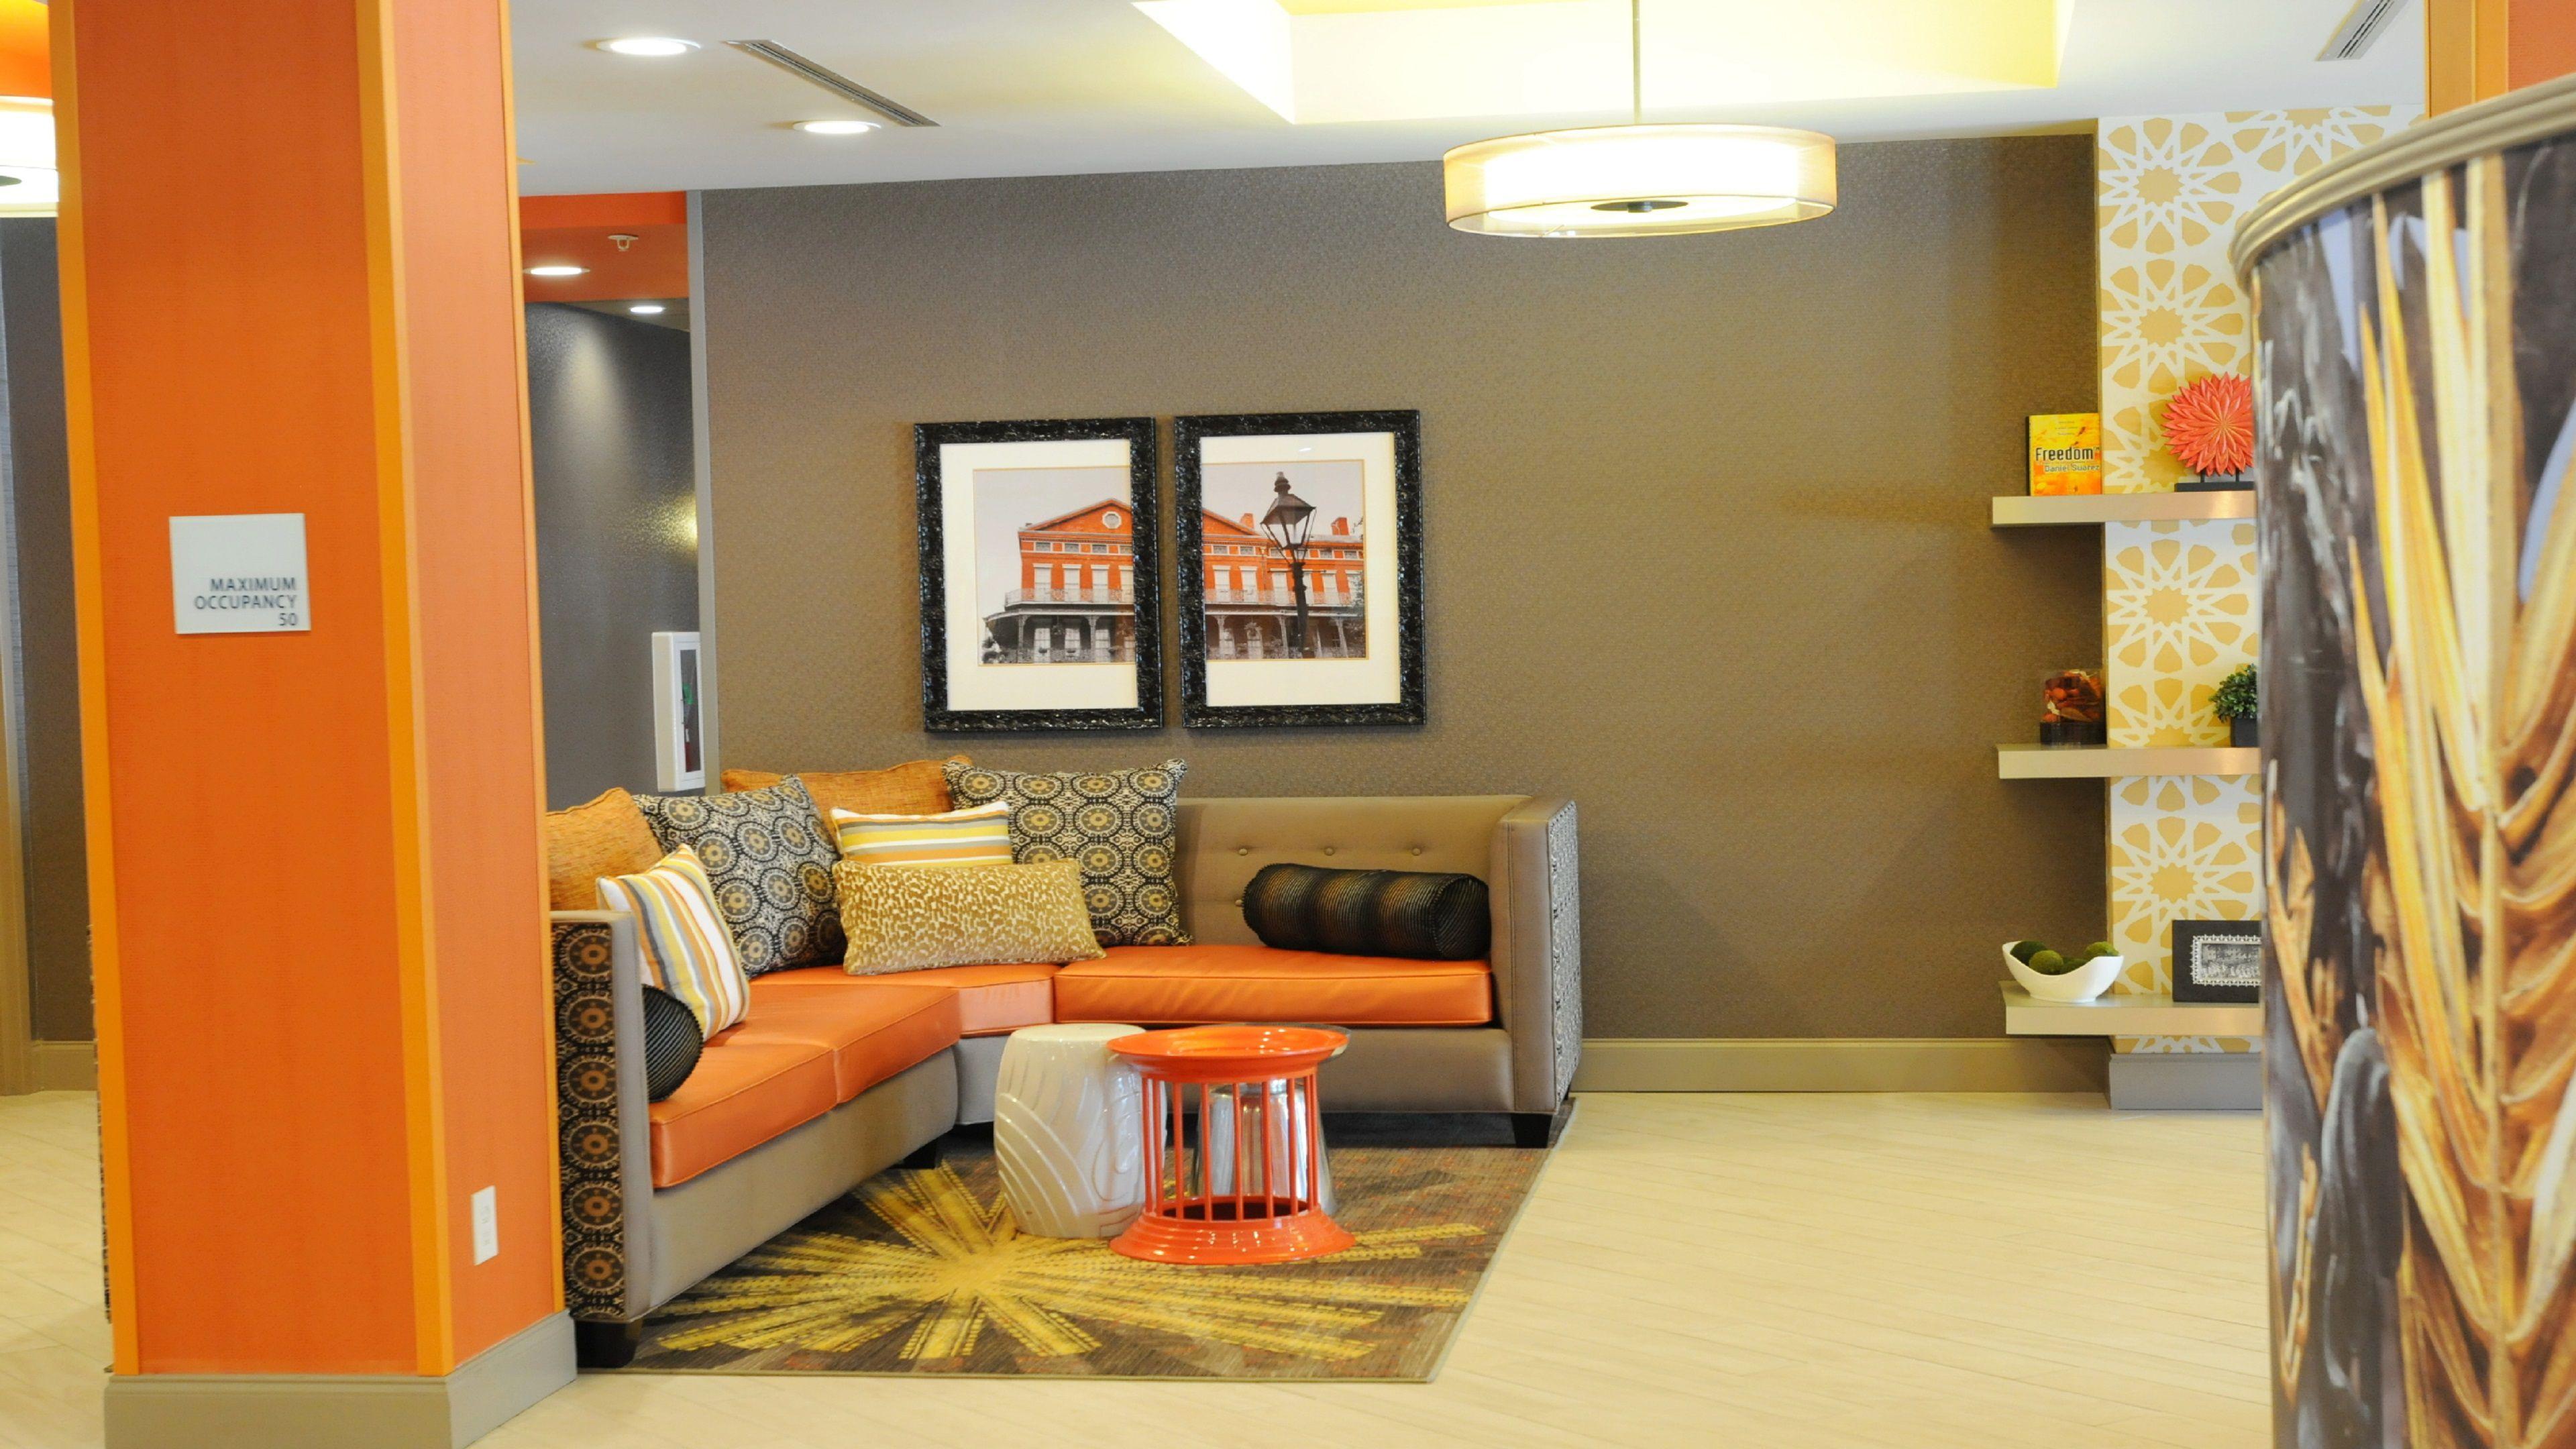 Holiday Inn Express Covington-Madisonville image 3